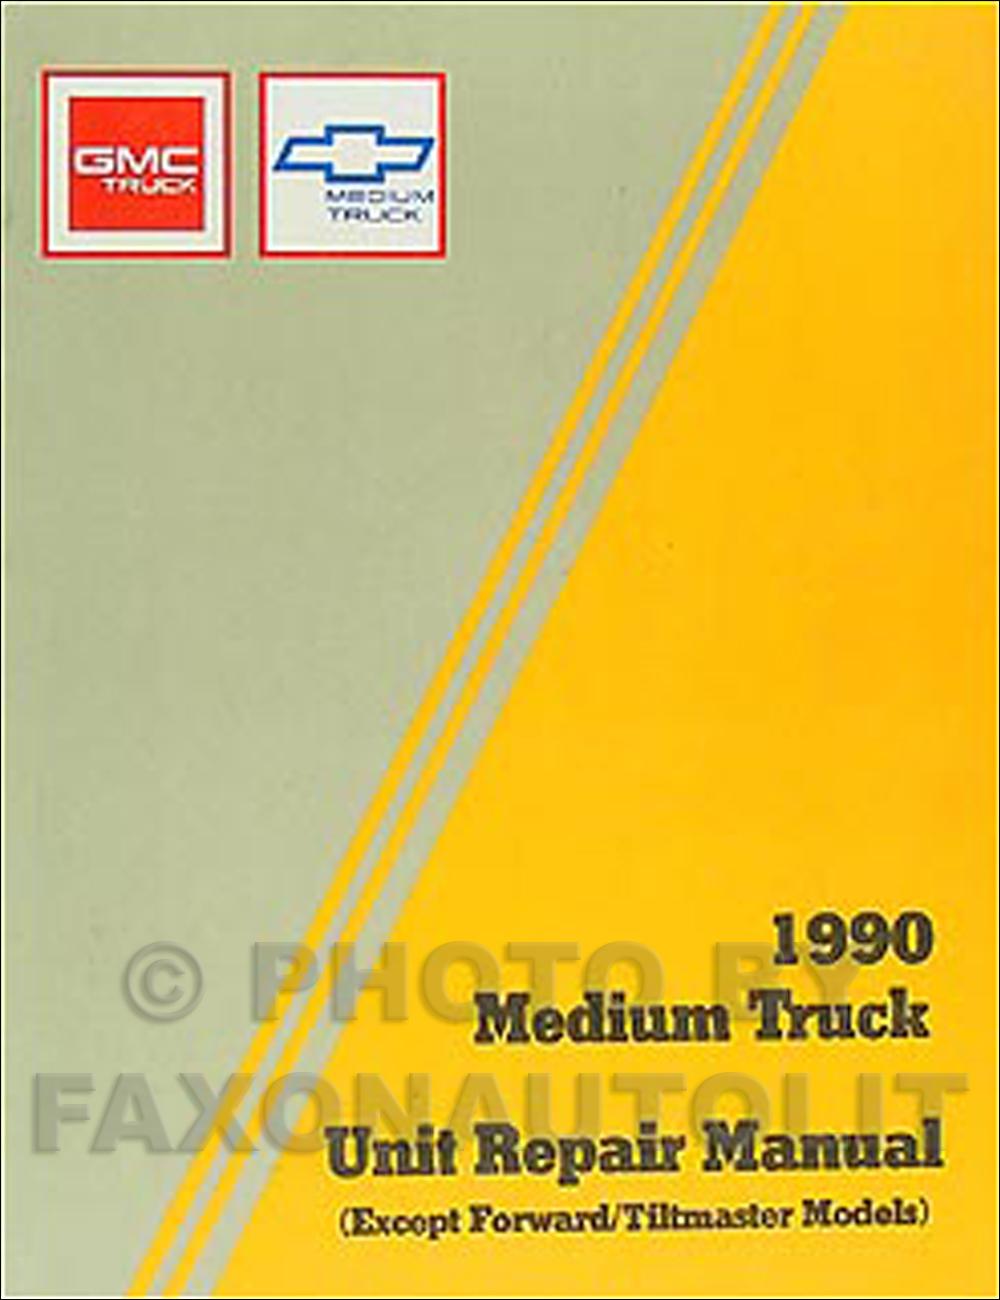 [SCHEMATICS_4FD]  FH_7225] 1990 Gmc Topkick Wiring Diagrams Download Diagram | 1990 Topkick Wiring Diagram |  | Scata Lectu Isop Vira Mohammedshrine Librar Wiring 101